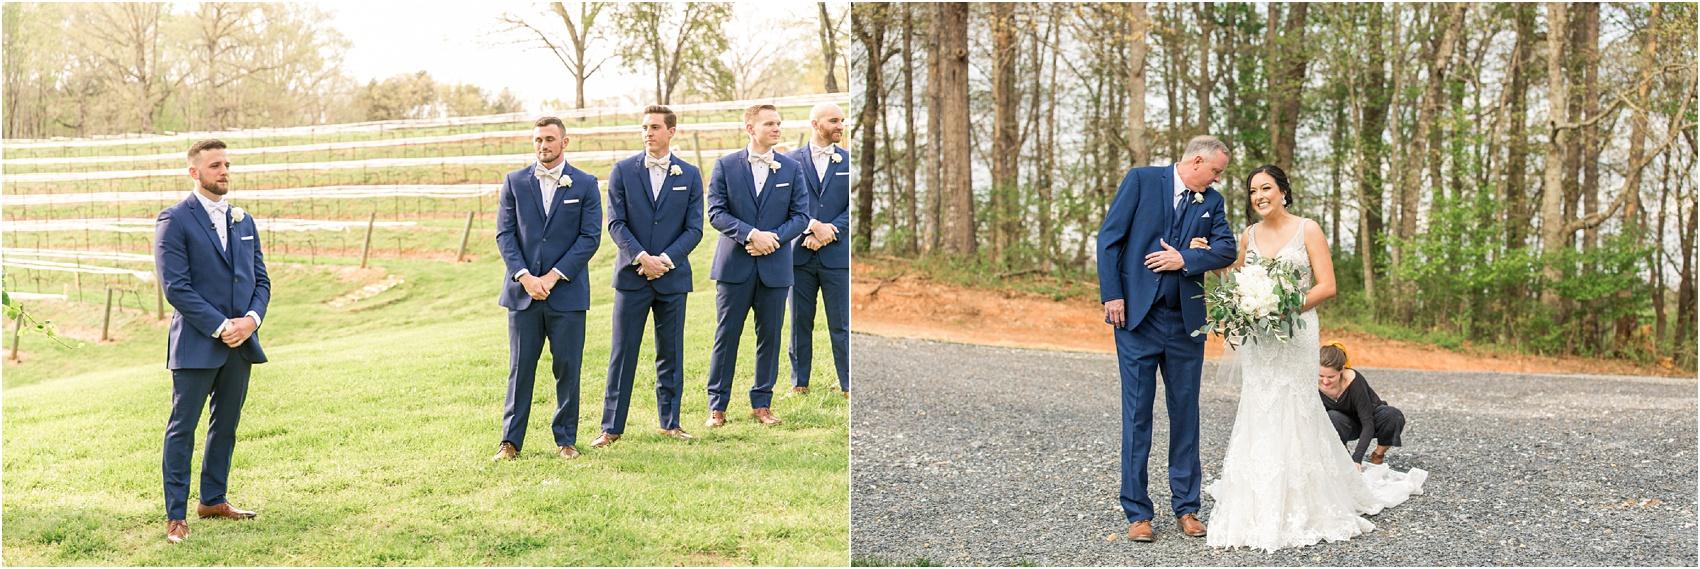 Savannah Eve Photography- Turnbill-Gilgan Wedding- Blog-35.jpg